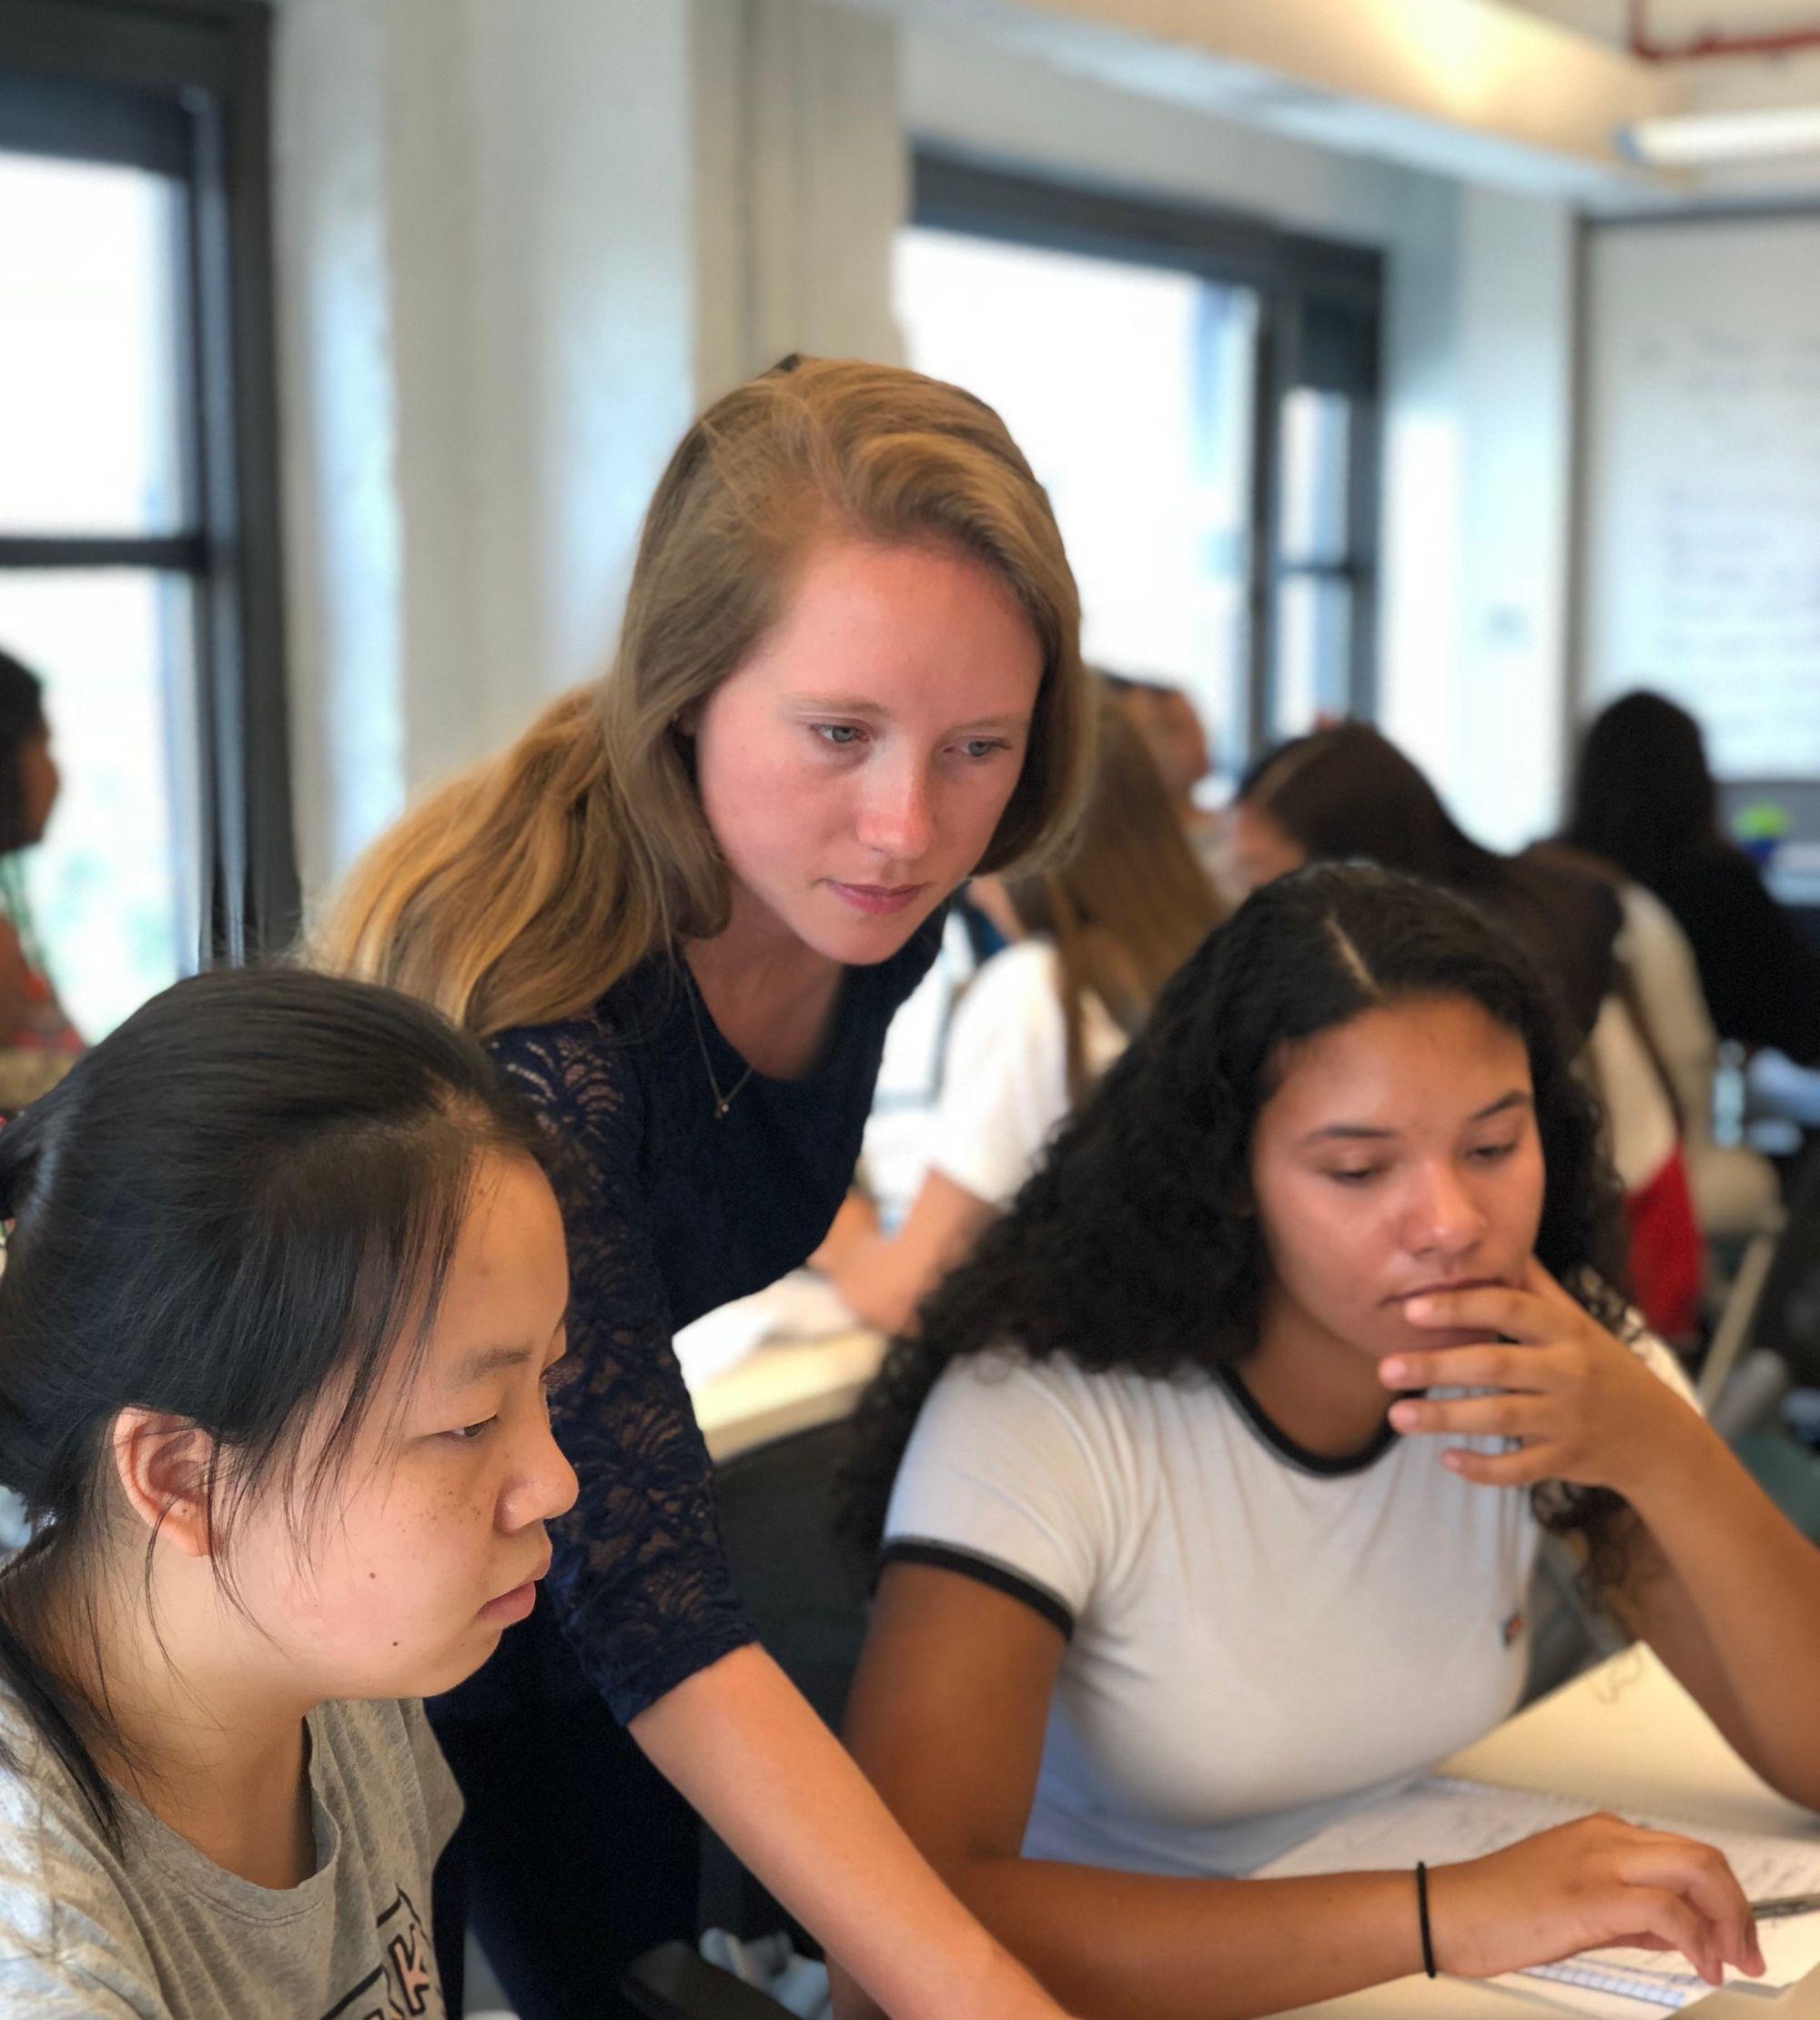 Woman teaching two girls in classroom.